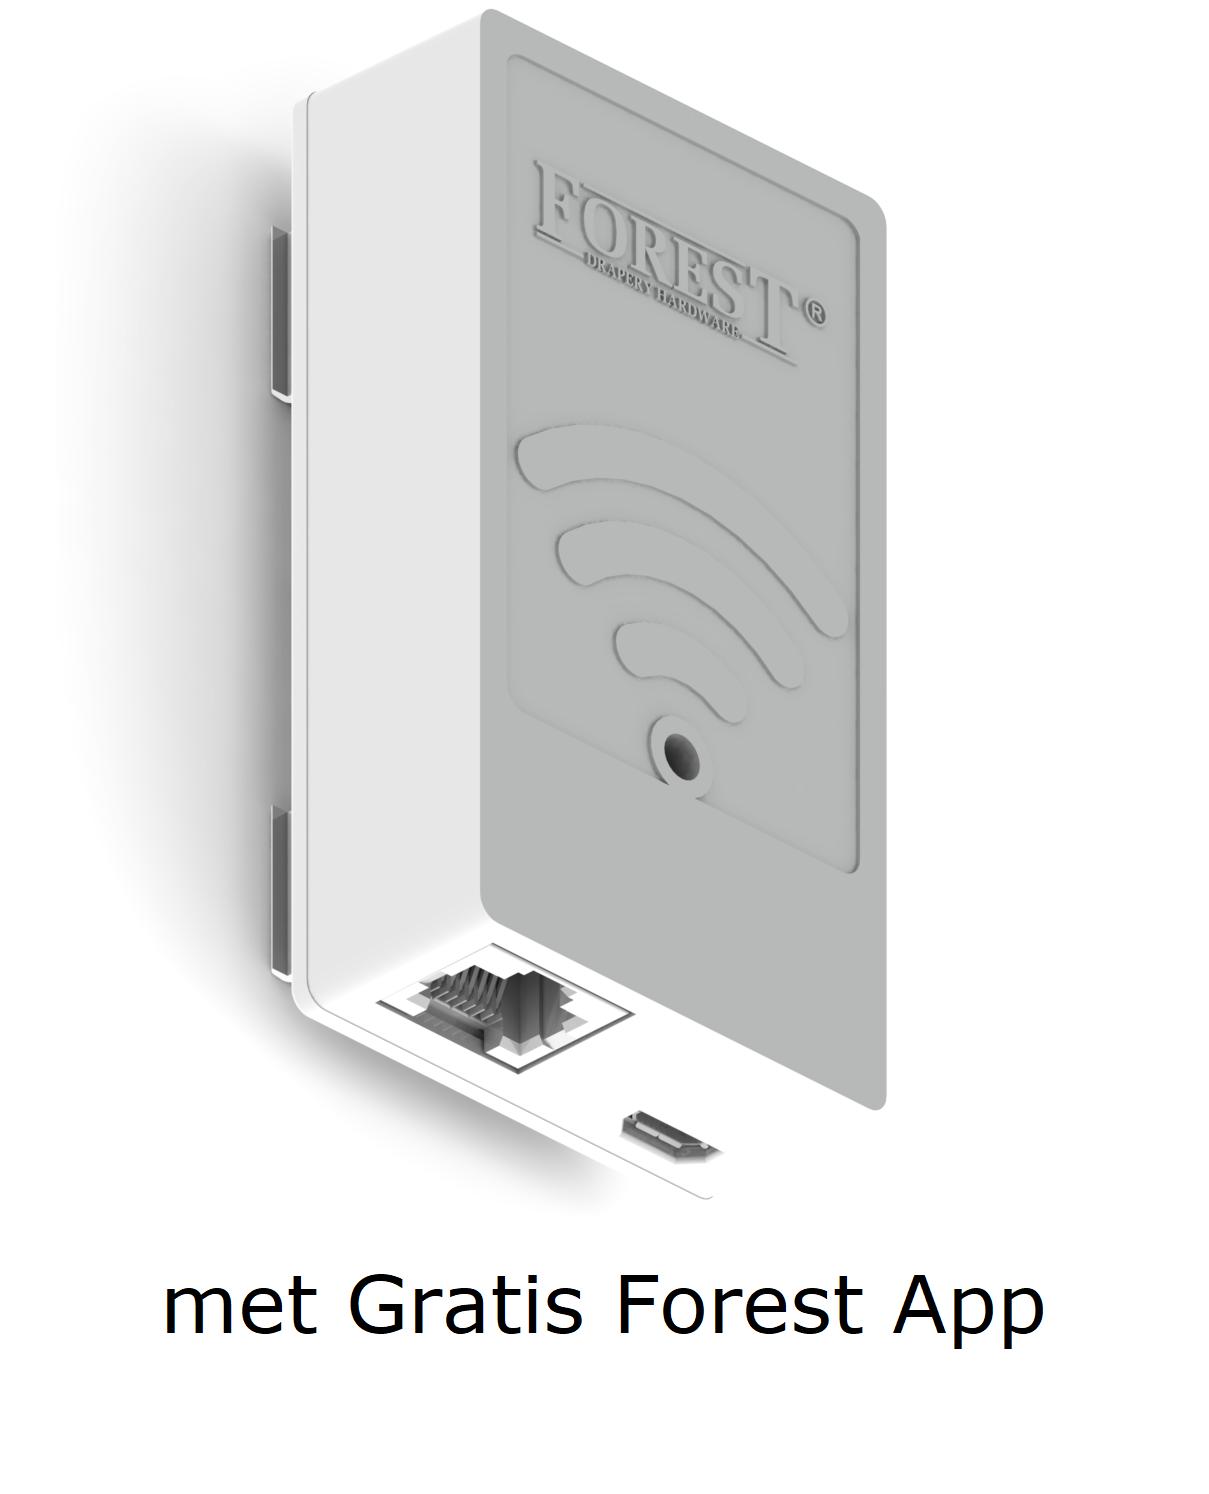 FOREST WIFI Dongle met gratis Forest app